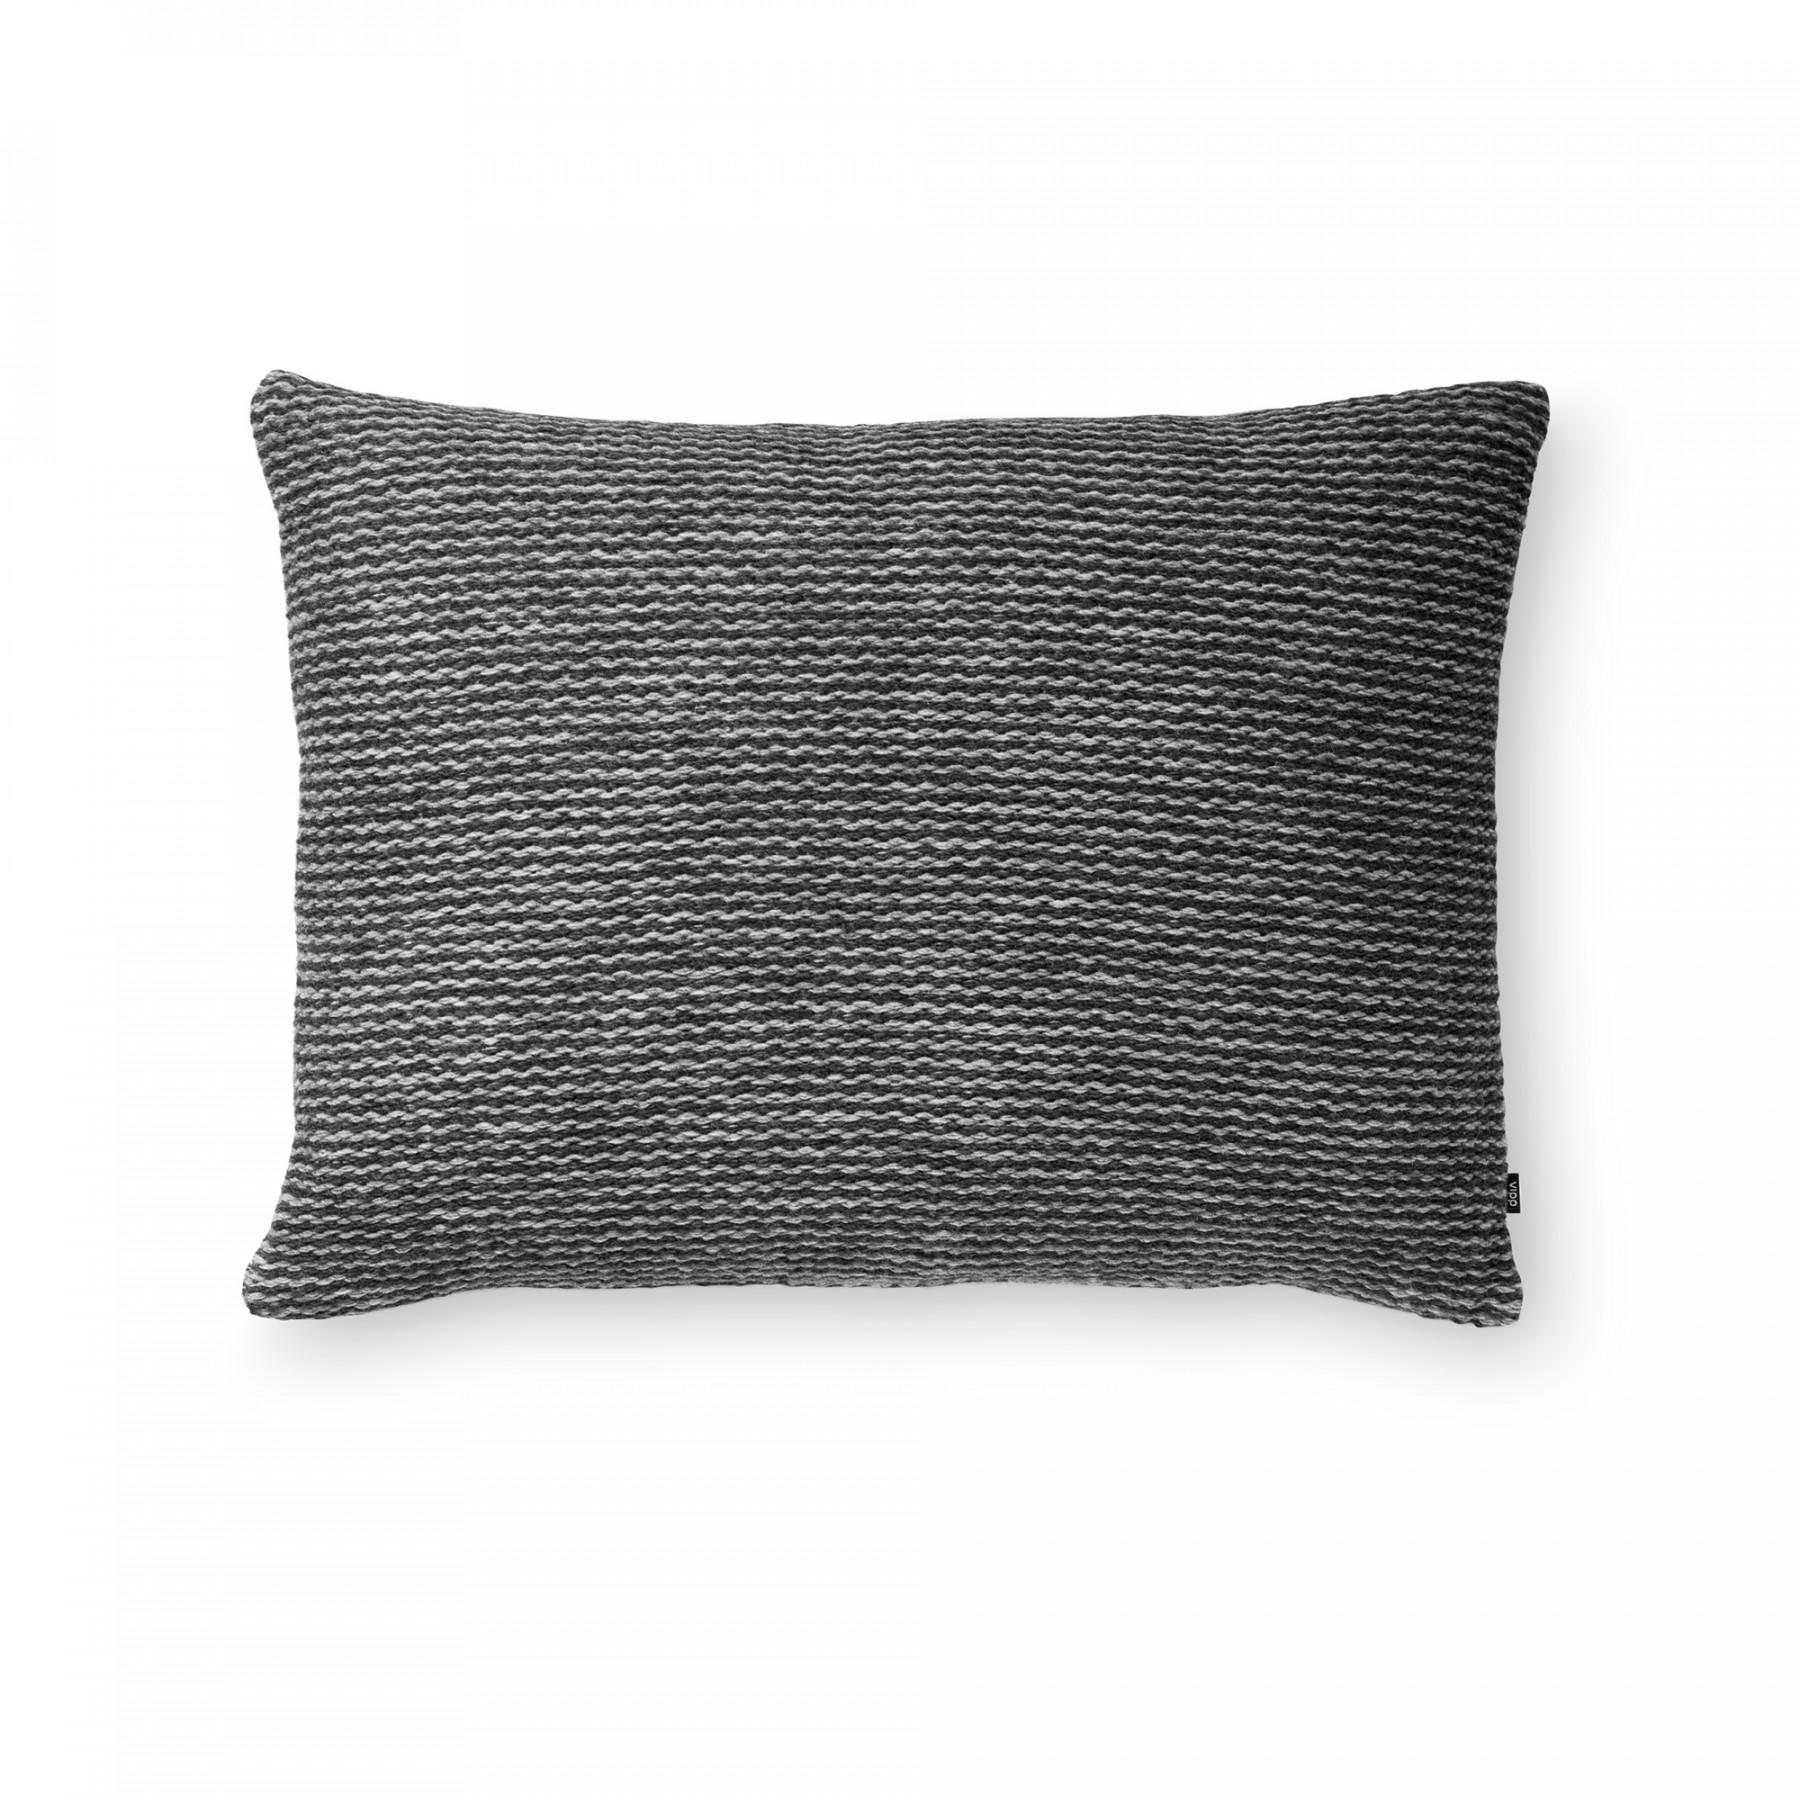 vipp Wool Pillow VIPP115, 11510, 5705953166951